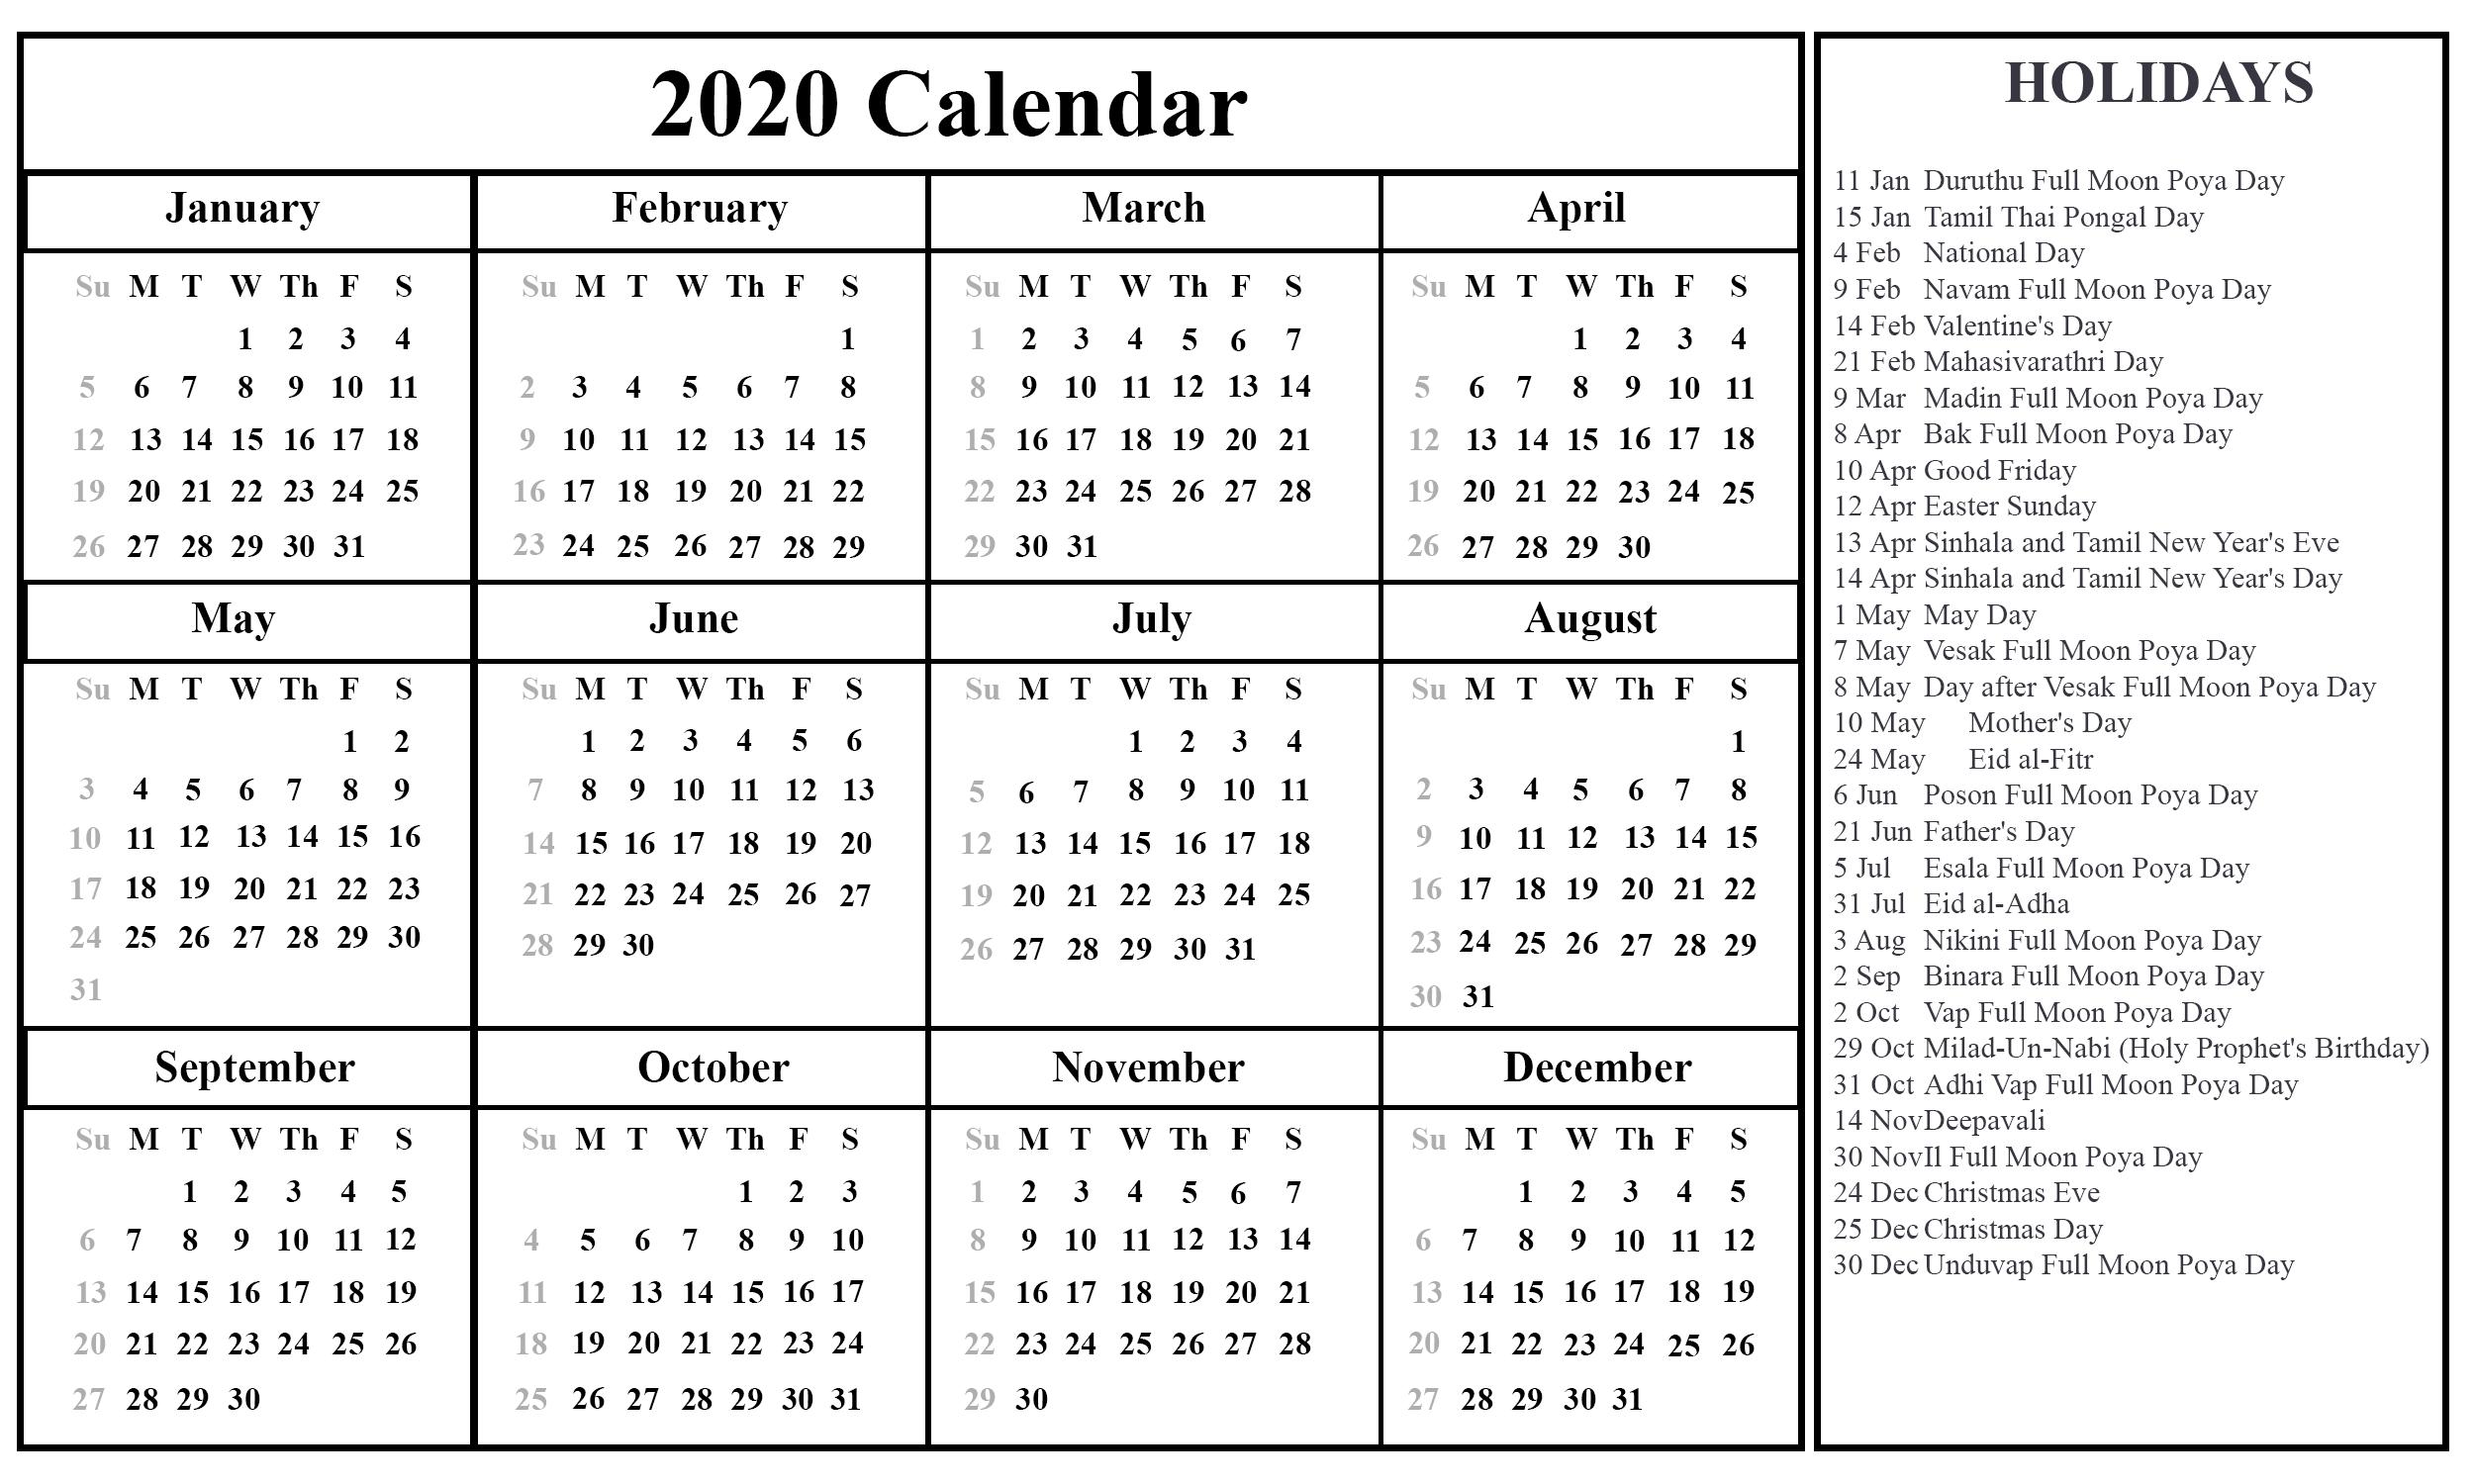 Календарь 2020 Png - Bagno.site